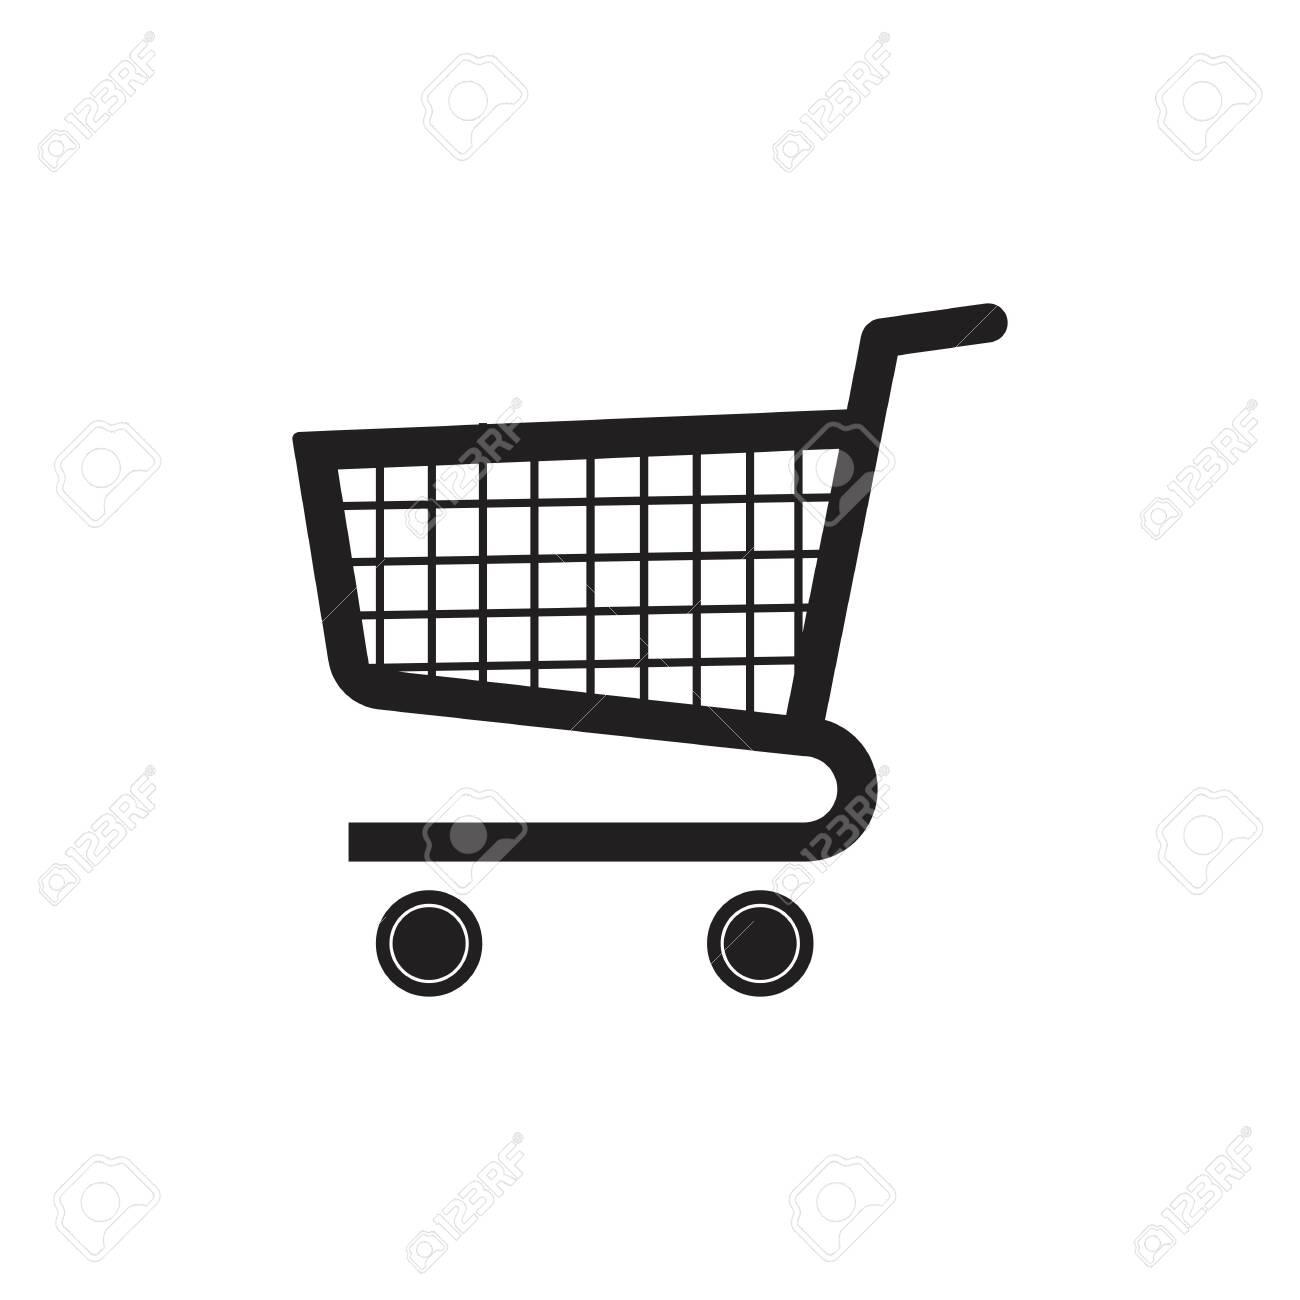 Shopping cart vector icon illustration design templateShopping cart sign icon, vector illustration. Flat design style - Vector - 135760756